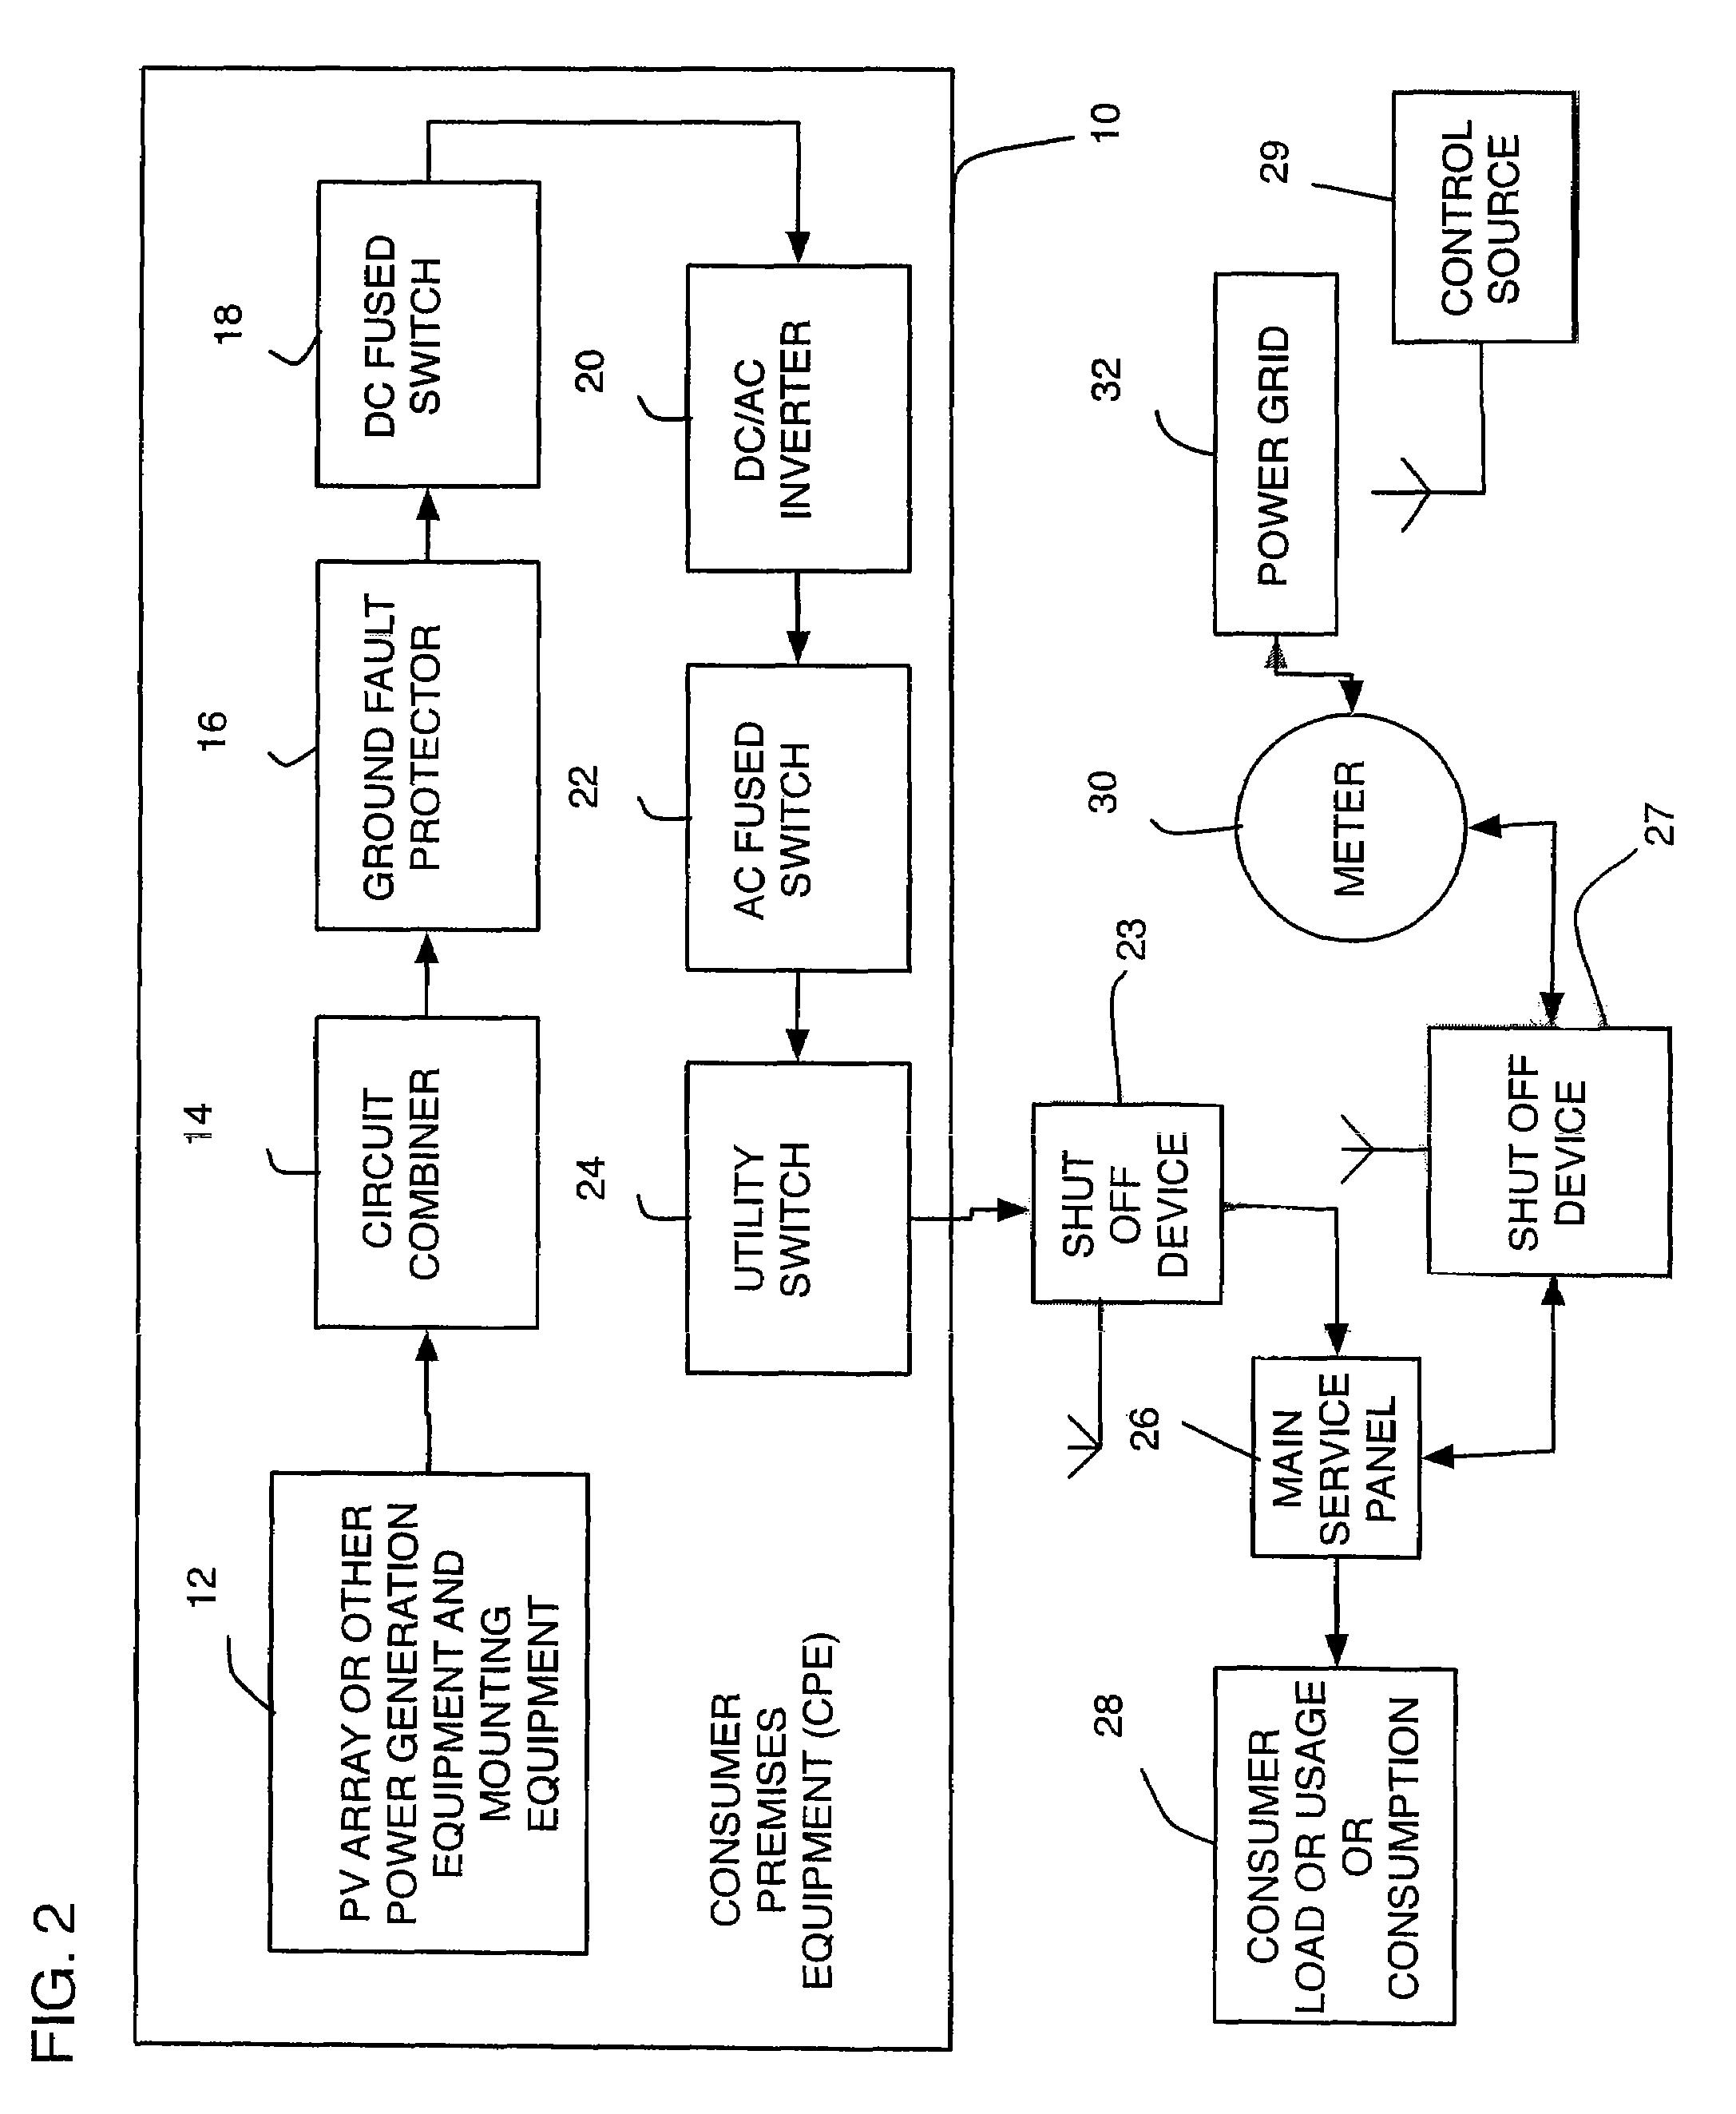 passtime wiring diagram Download-Passtime Gps Wiring Diagram Within 2-e